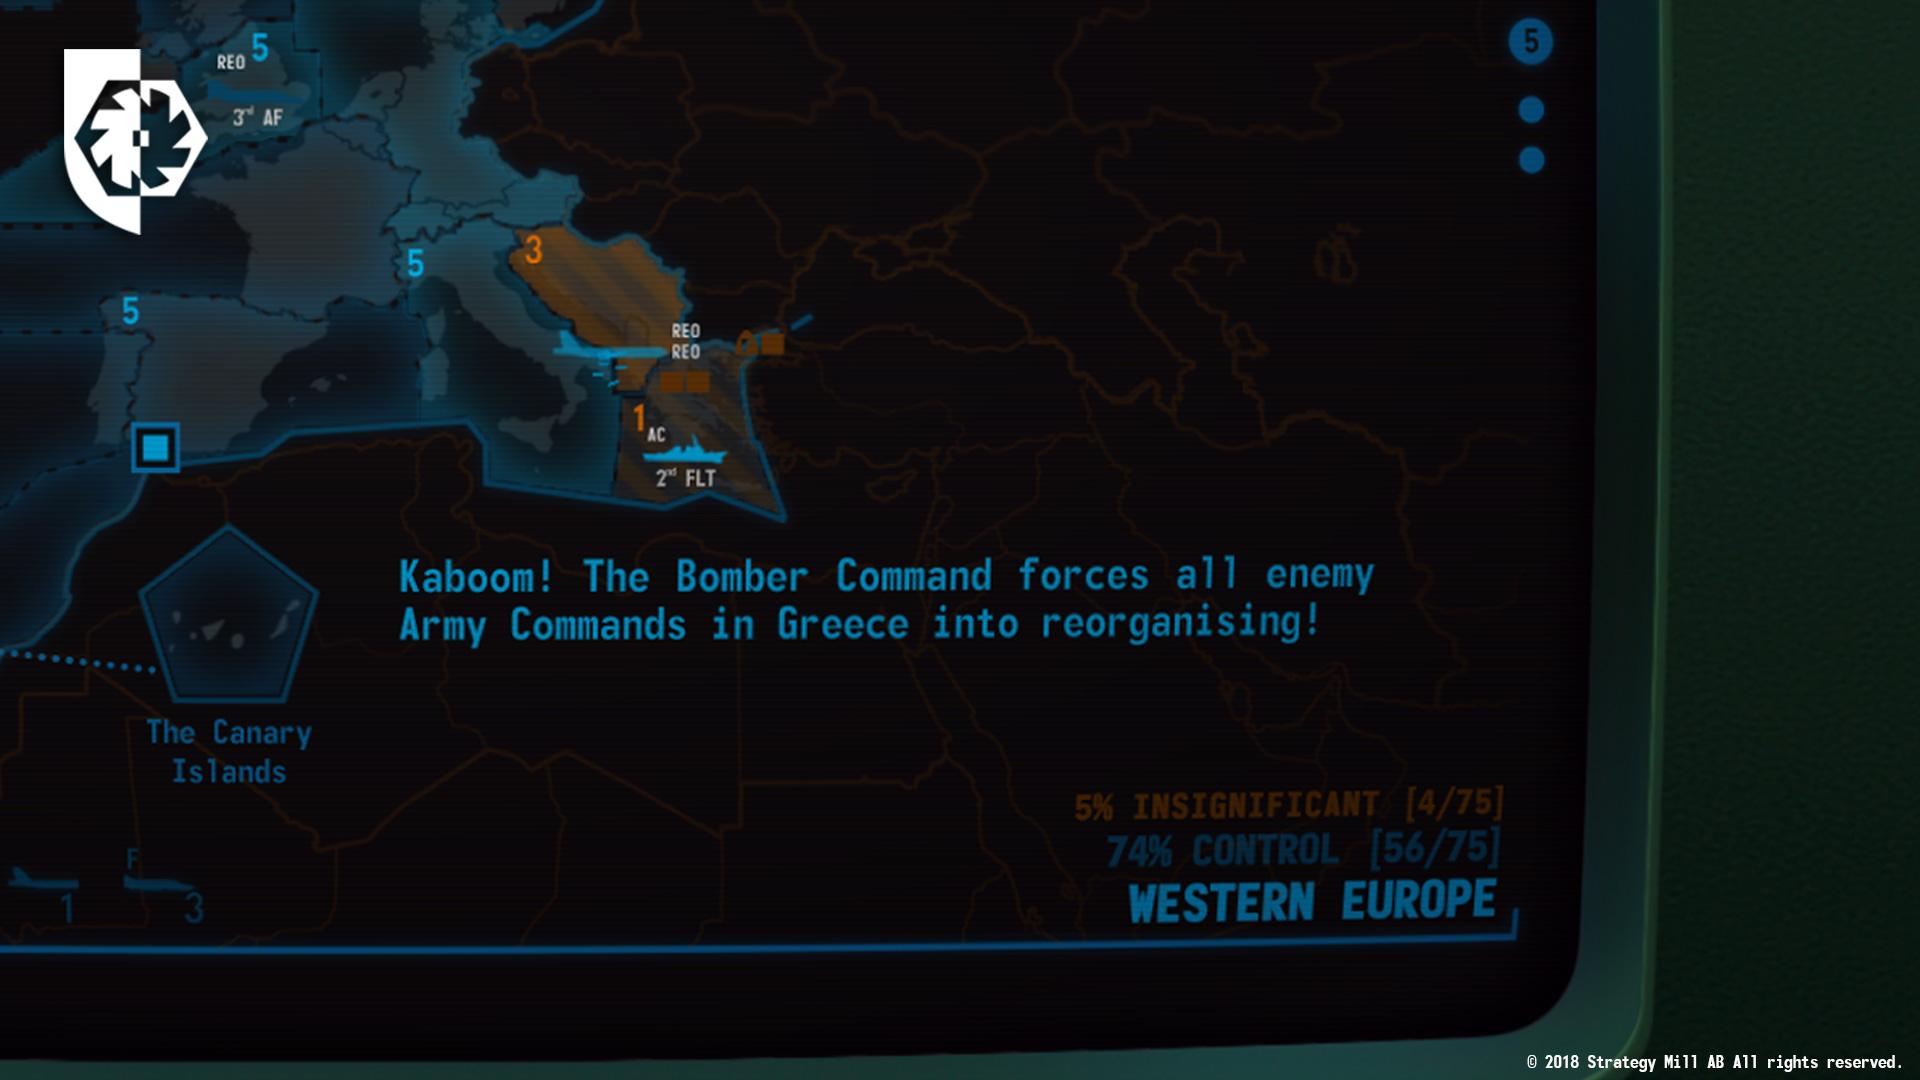 TerminalConflict BomberCommand